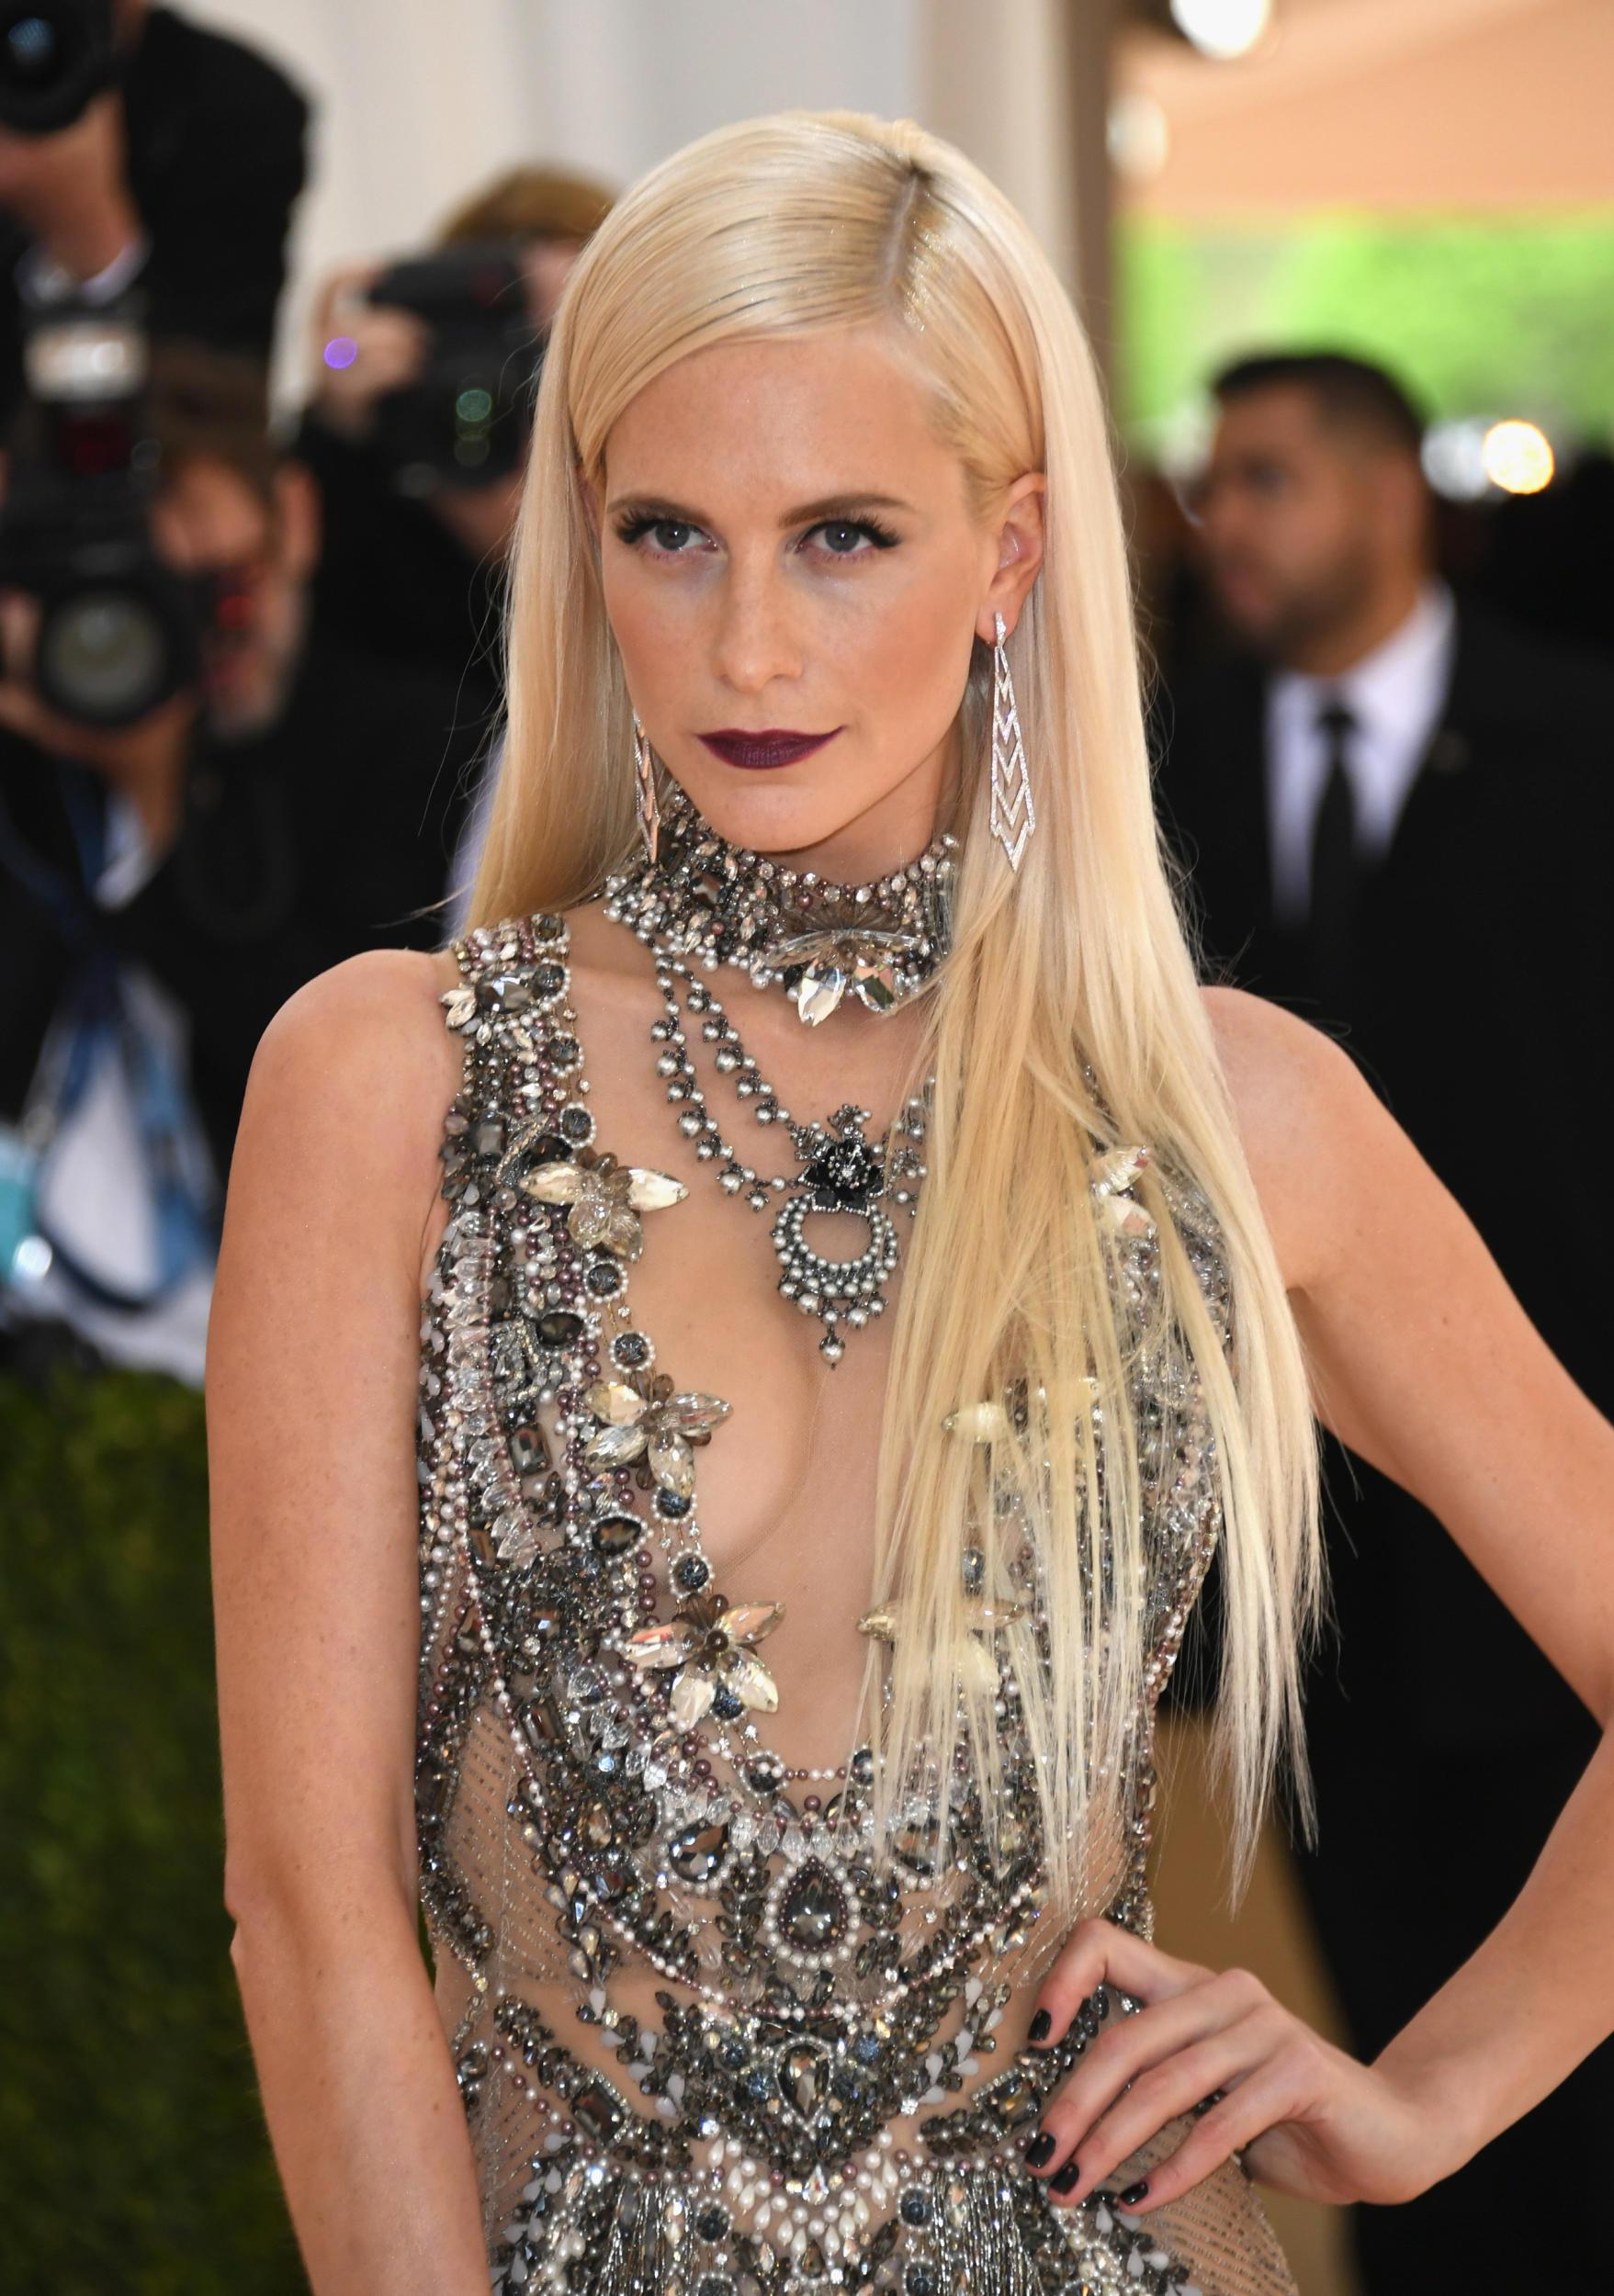 poppy delevingne platinum hair, 2016 met gala dresses